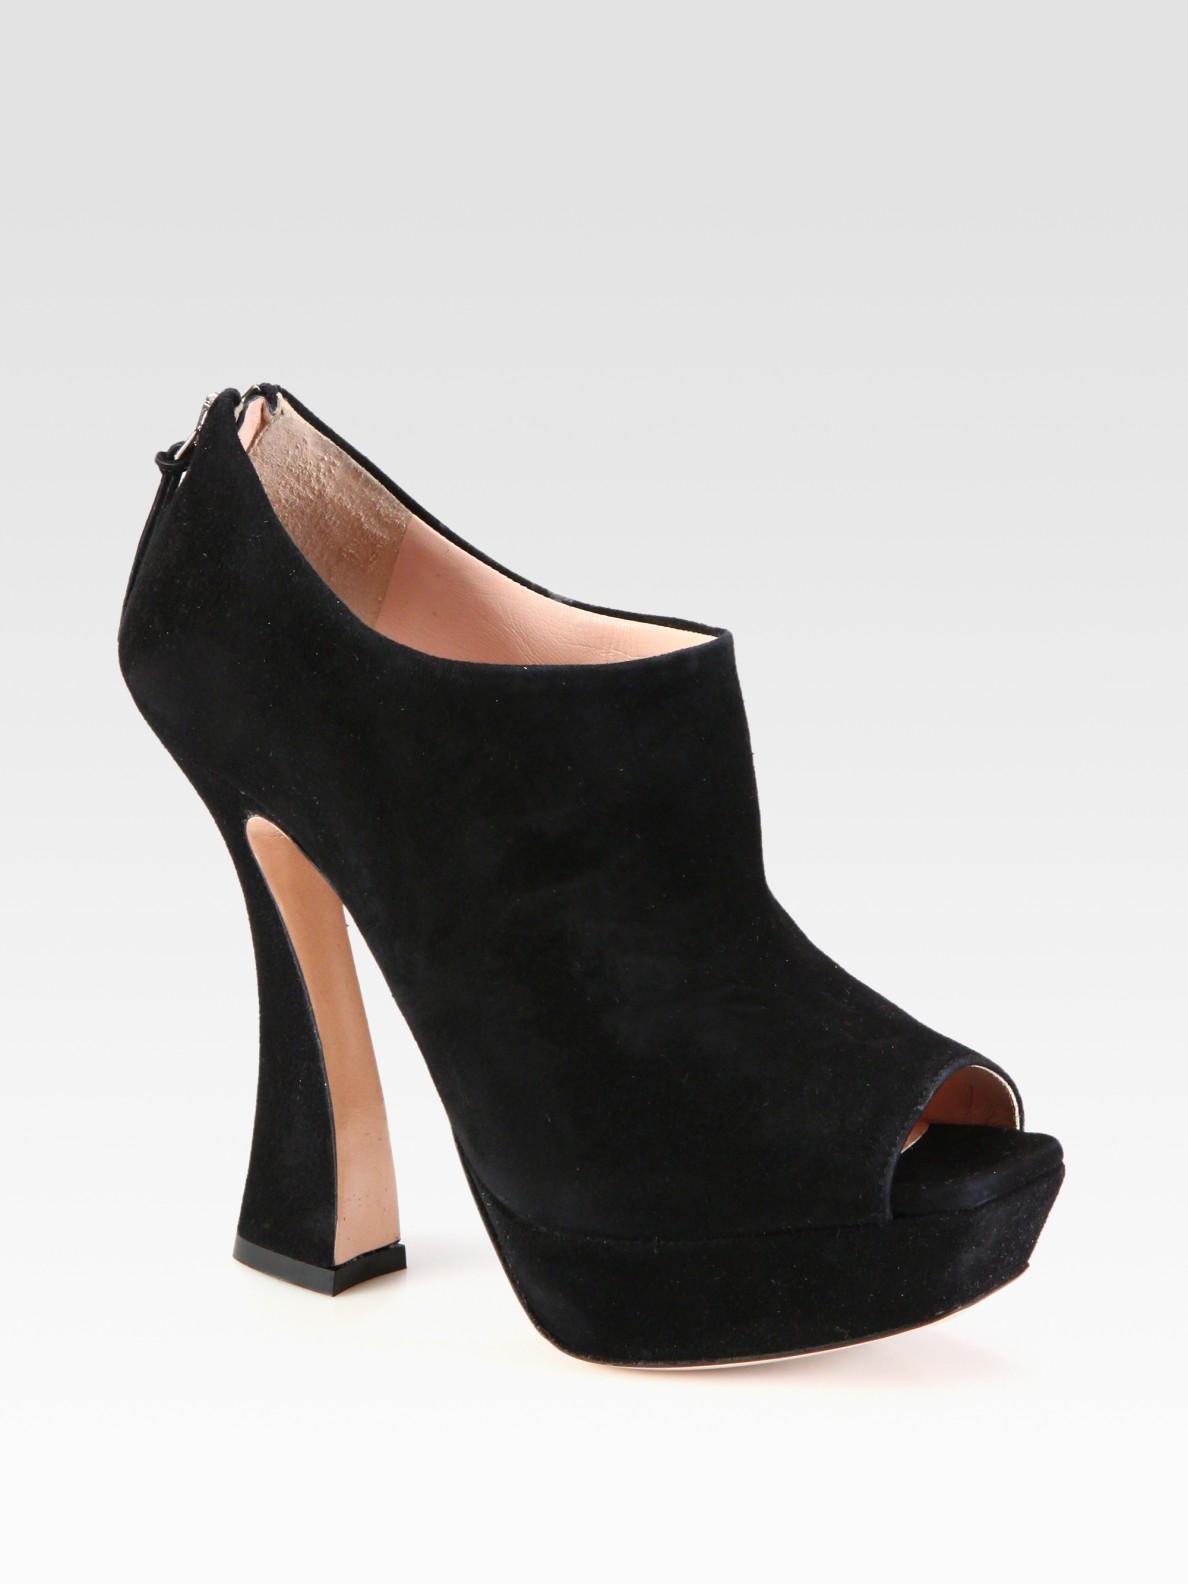 miu miu suede peep toe ankle boots in black lyst